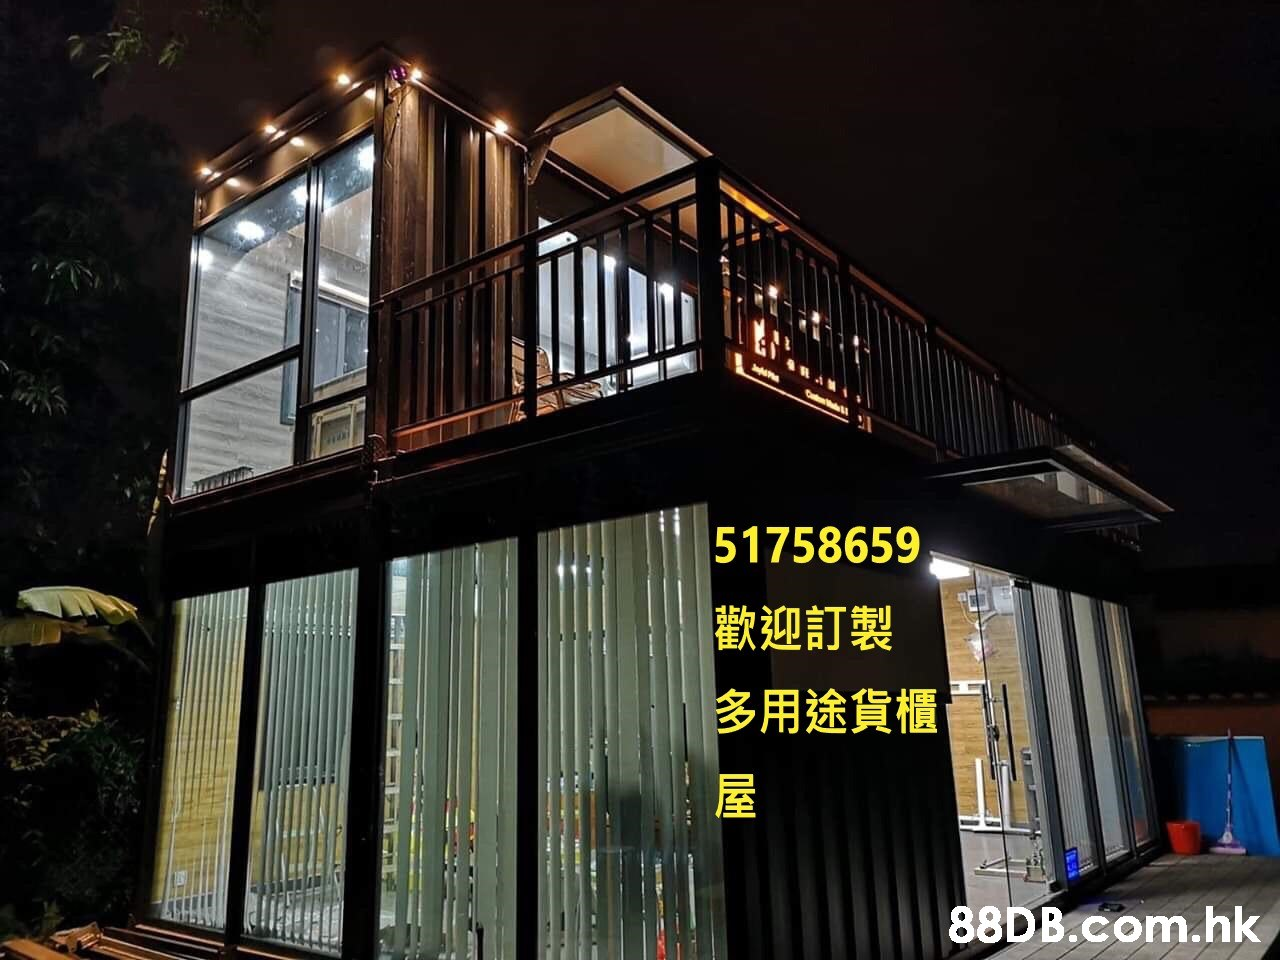 51758659 歡迎訂製 多用途貨櫃 屋 .hk nISH  Lighting,Architecture,Home,House,Building